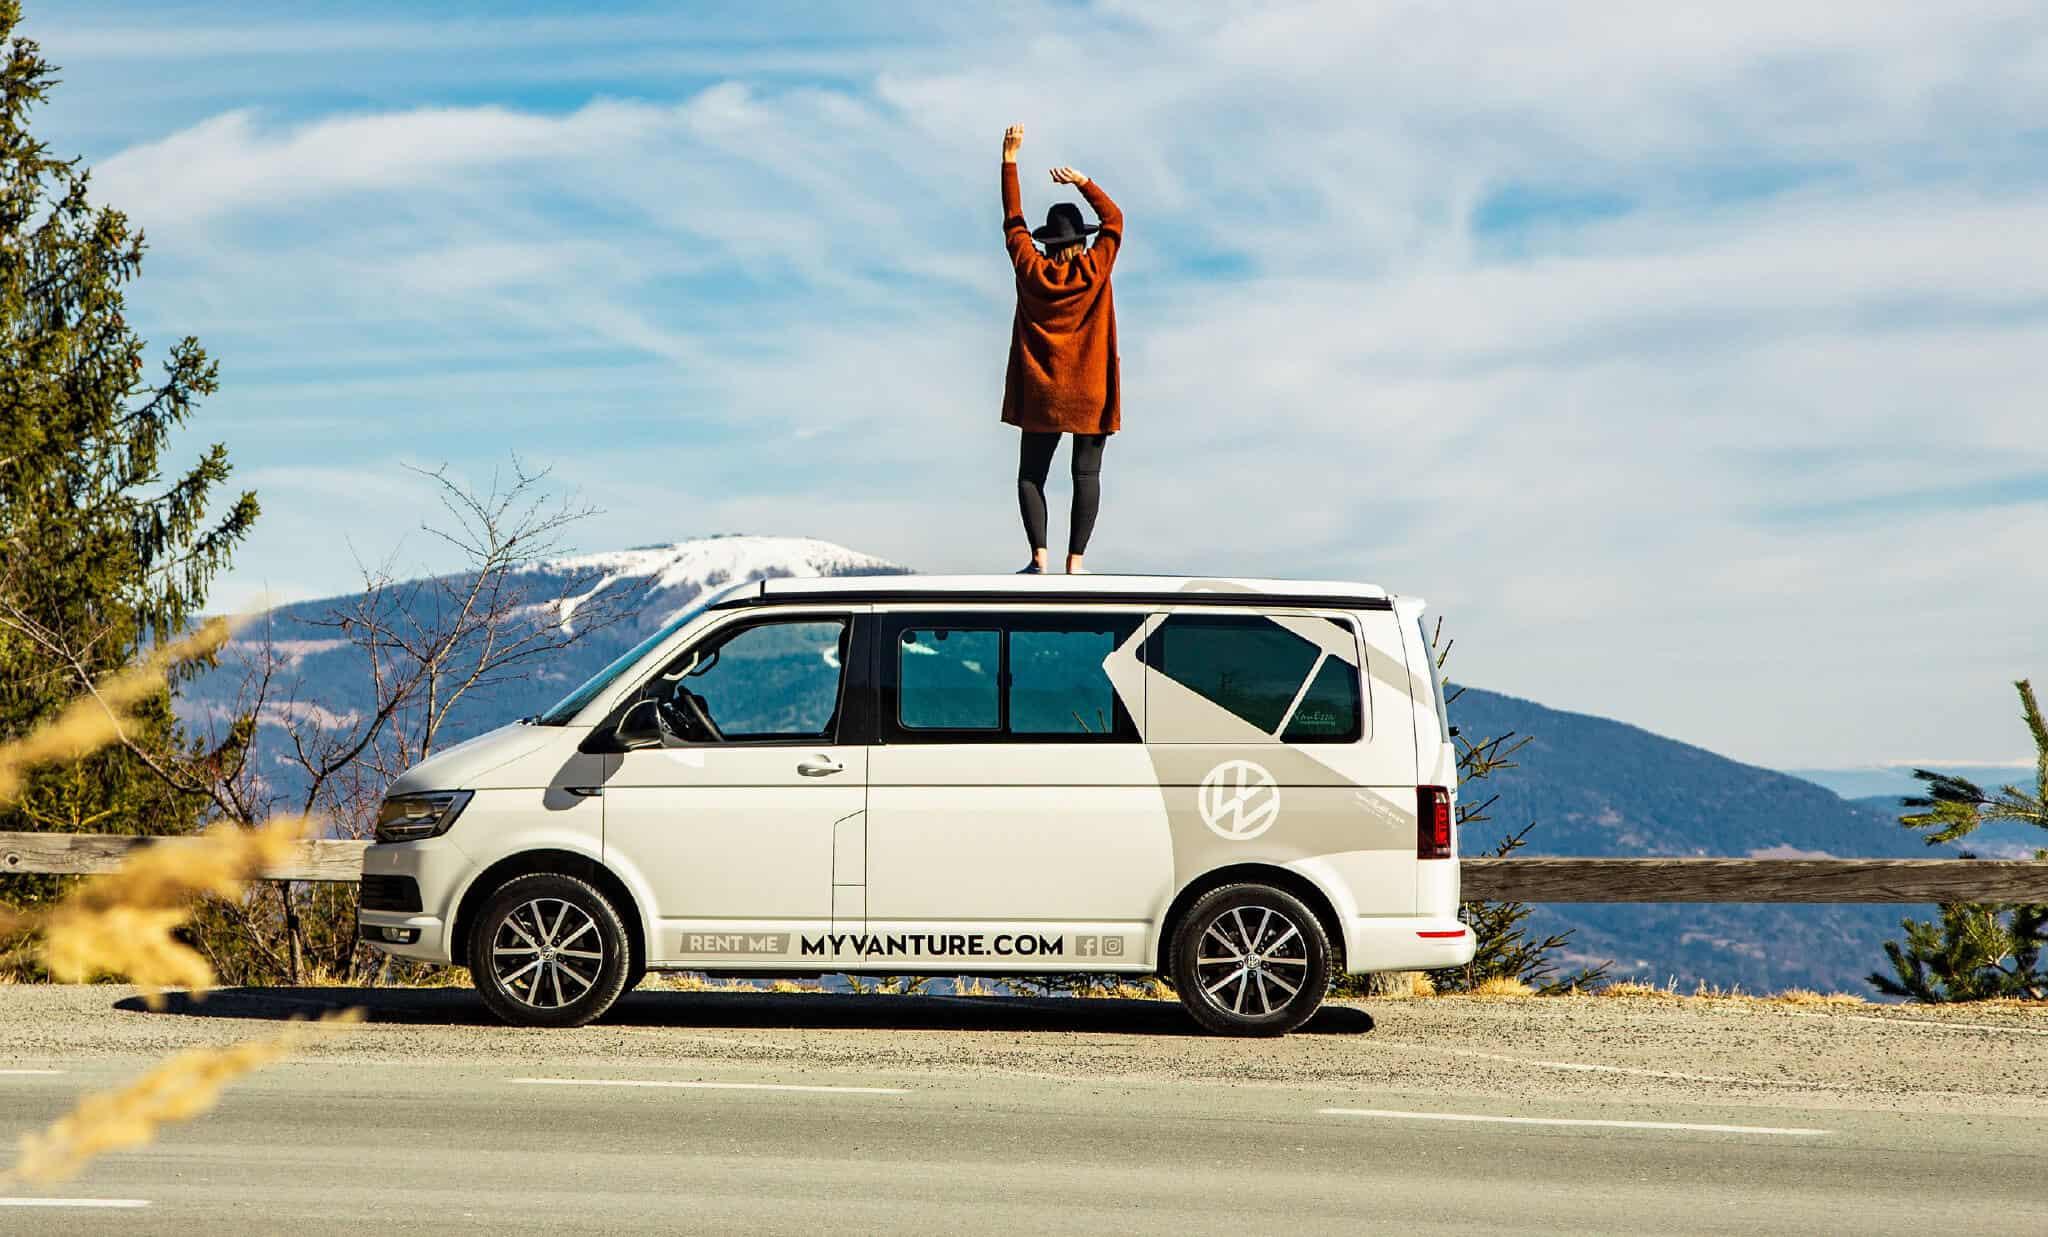 My Vanture - Deine VW California Campingbusvermietung!